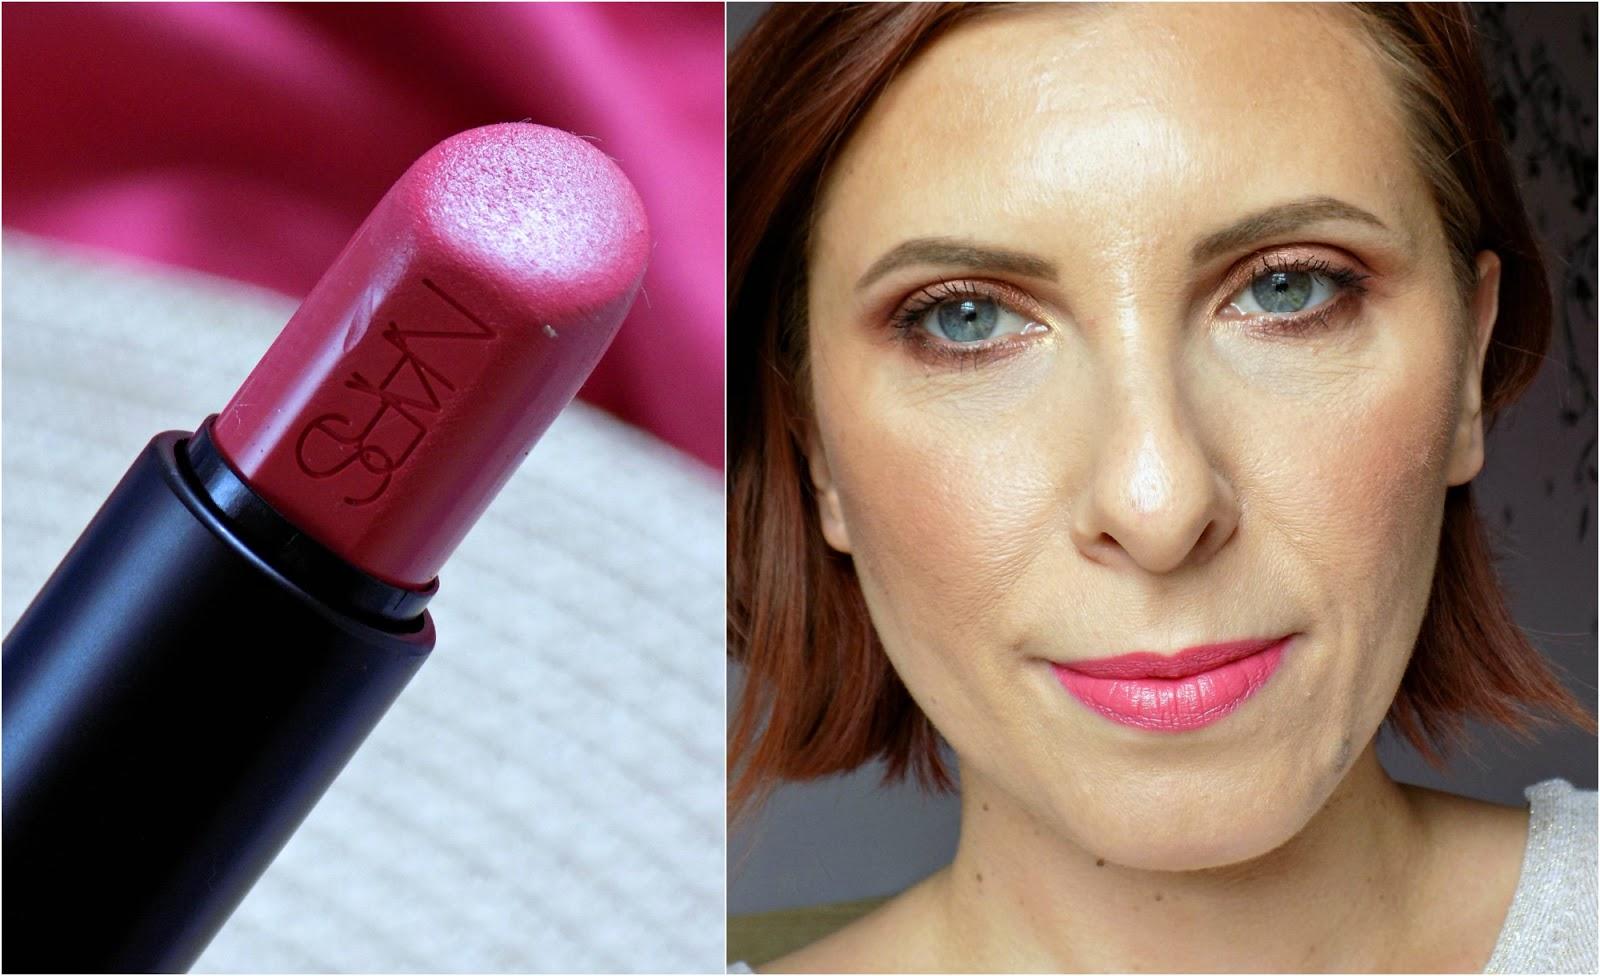 NARS Audacious Lipstick in Natalie